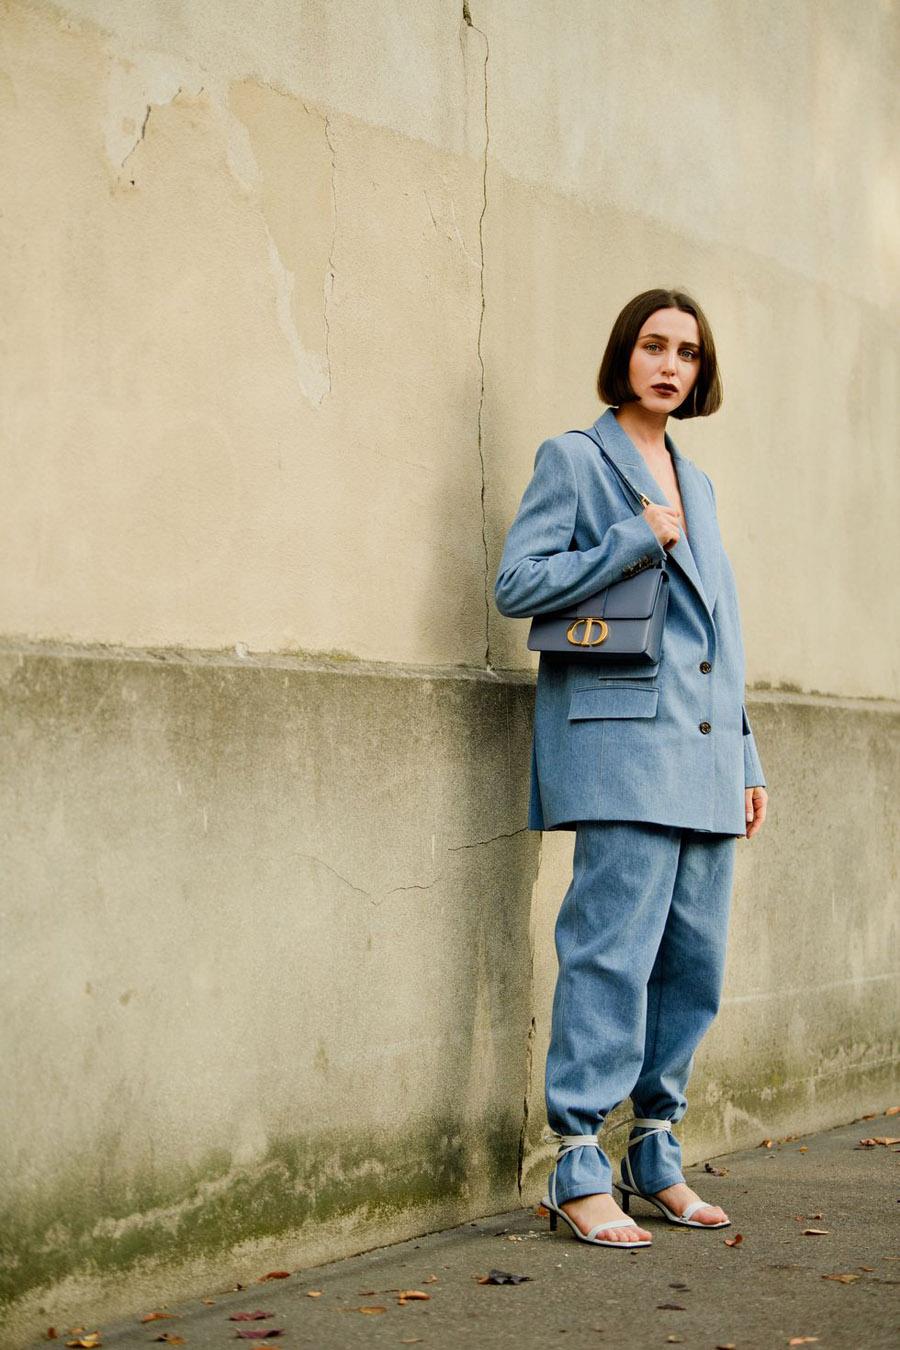 paris-fashion-week-pfw-street-style-ss20-day-6-by-tyler-joe-143-1569835097